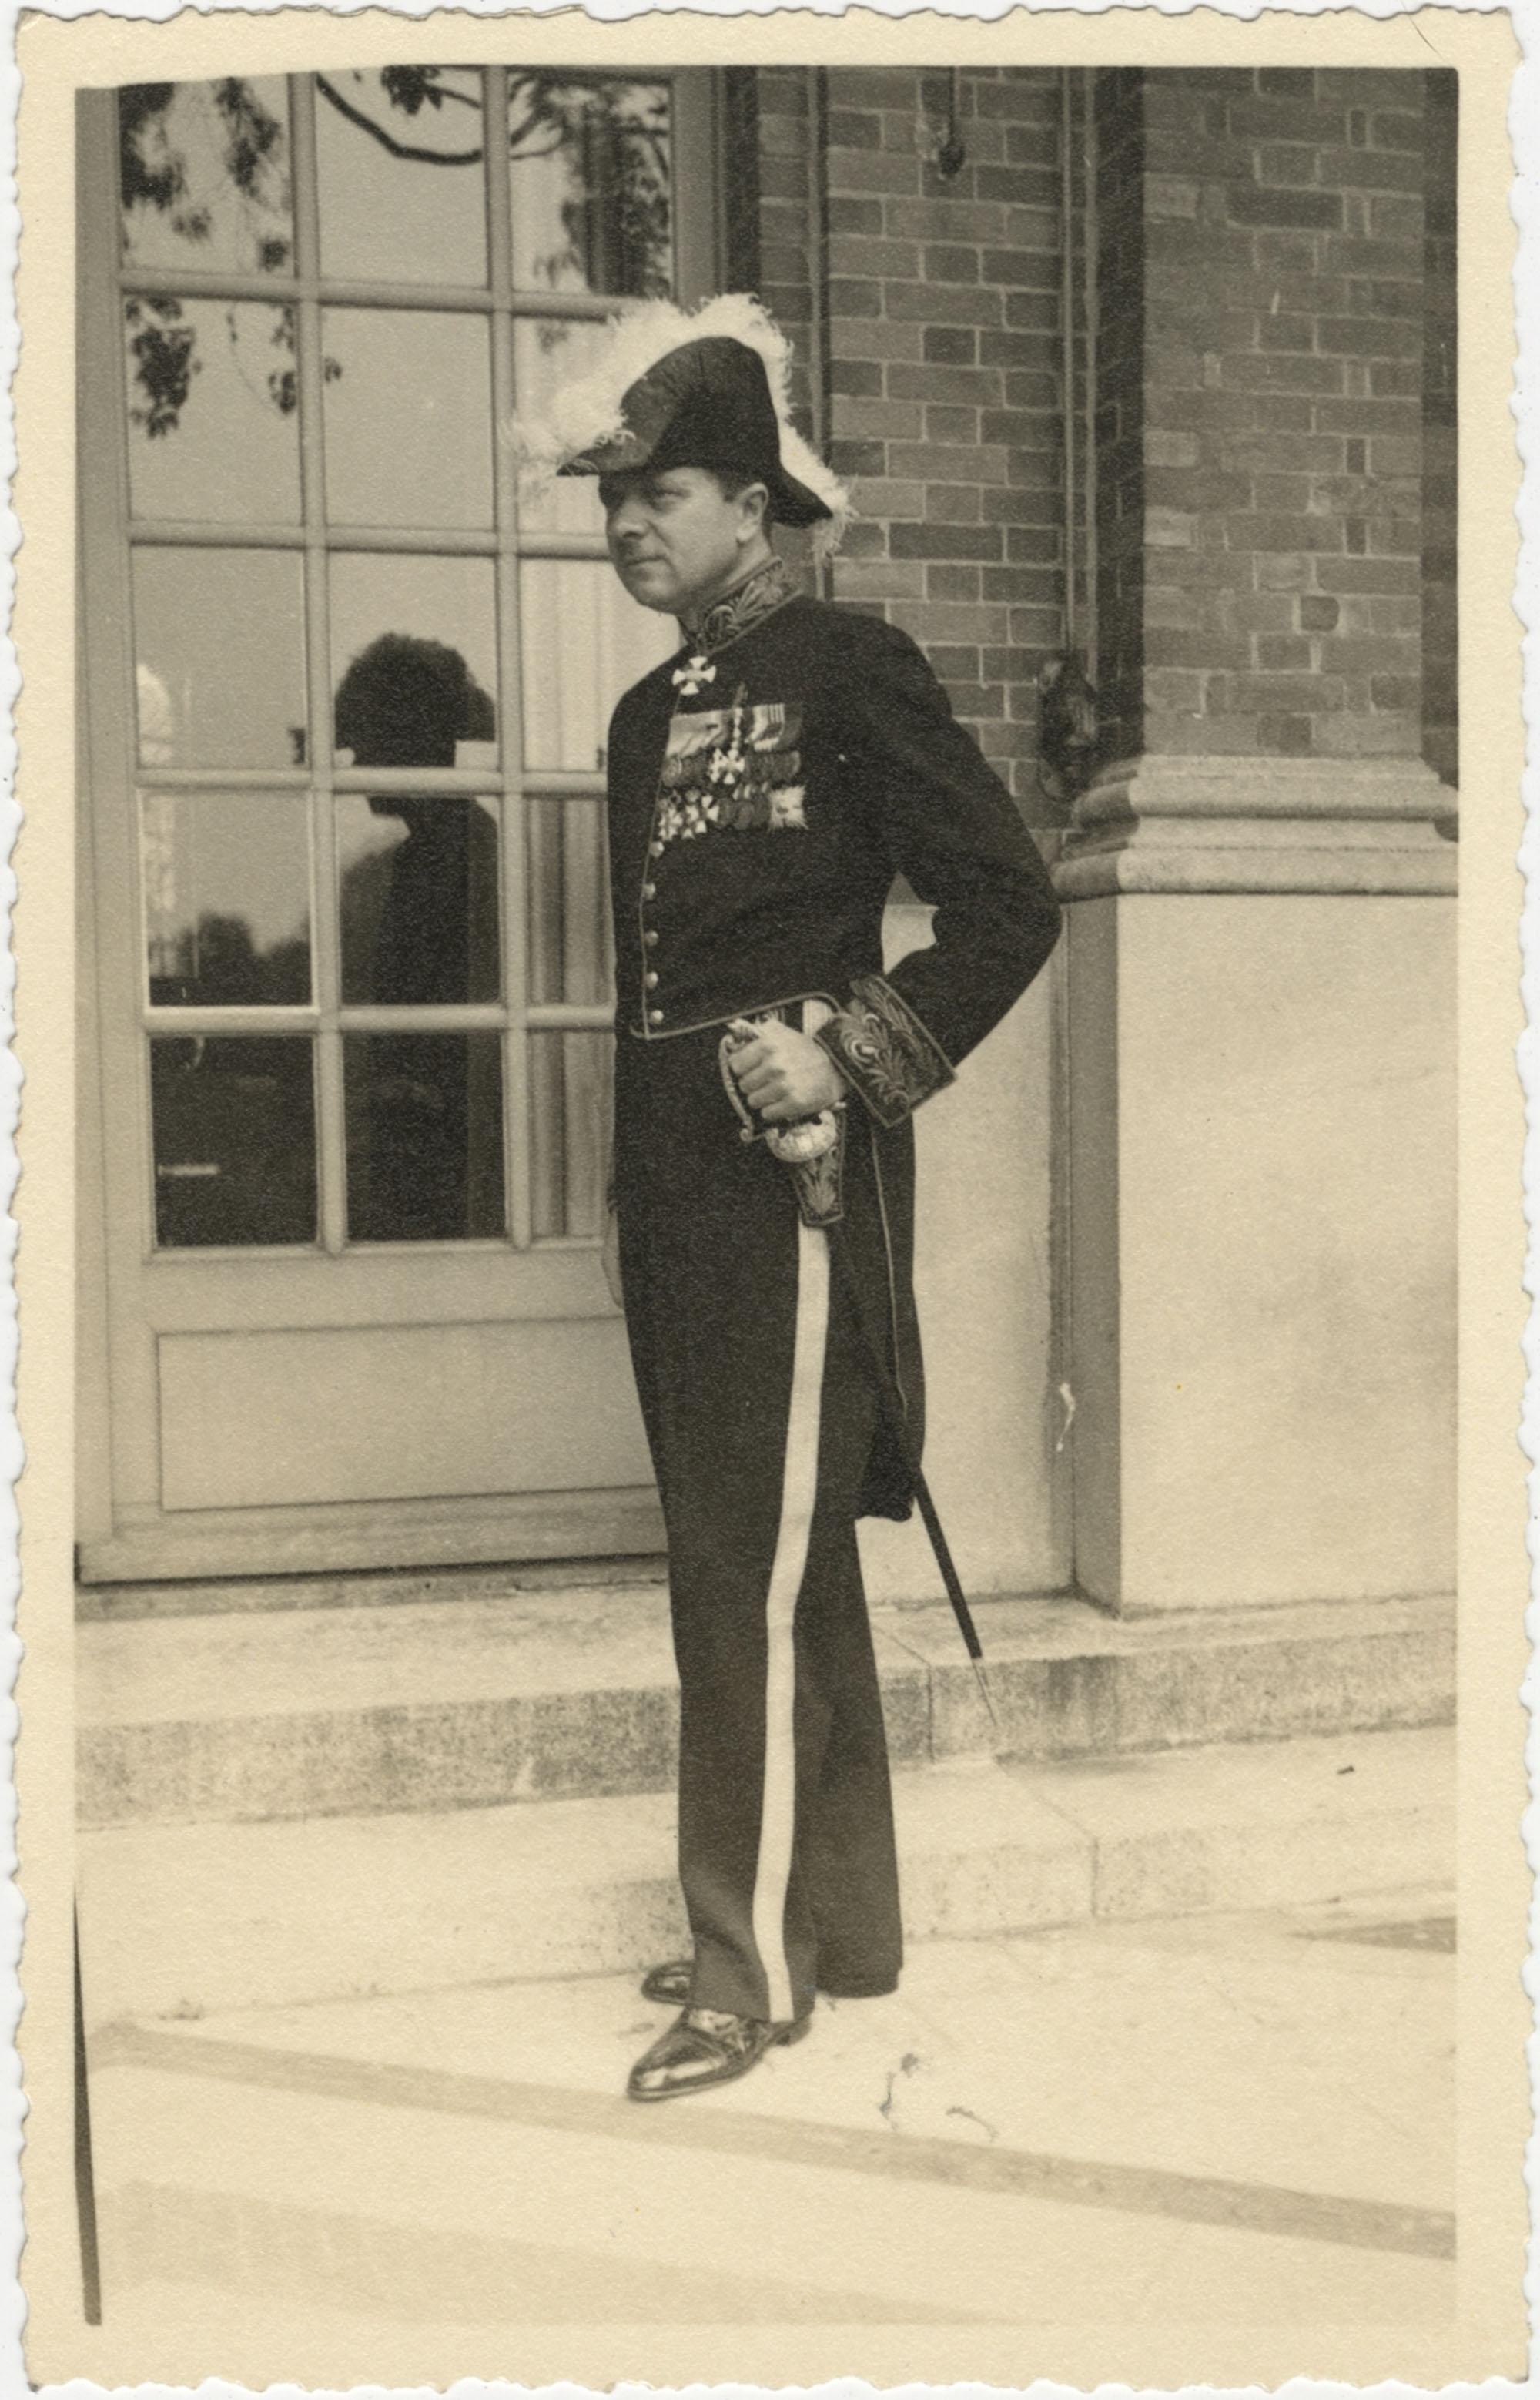 Mario Pansa in full dress uniform, Photograph 1